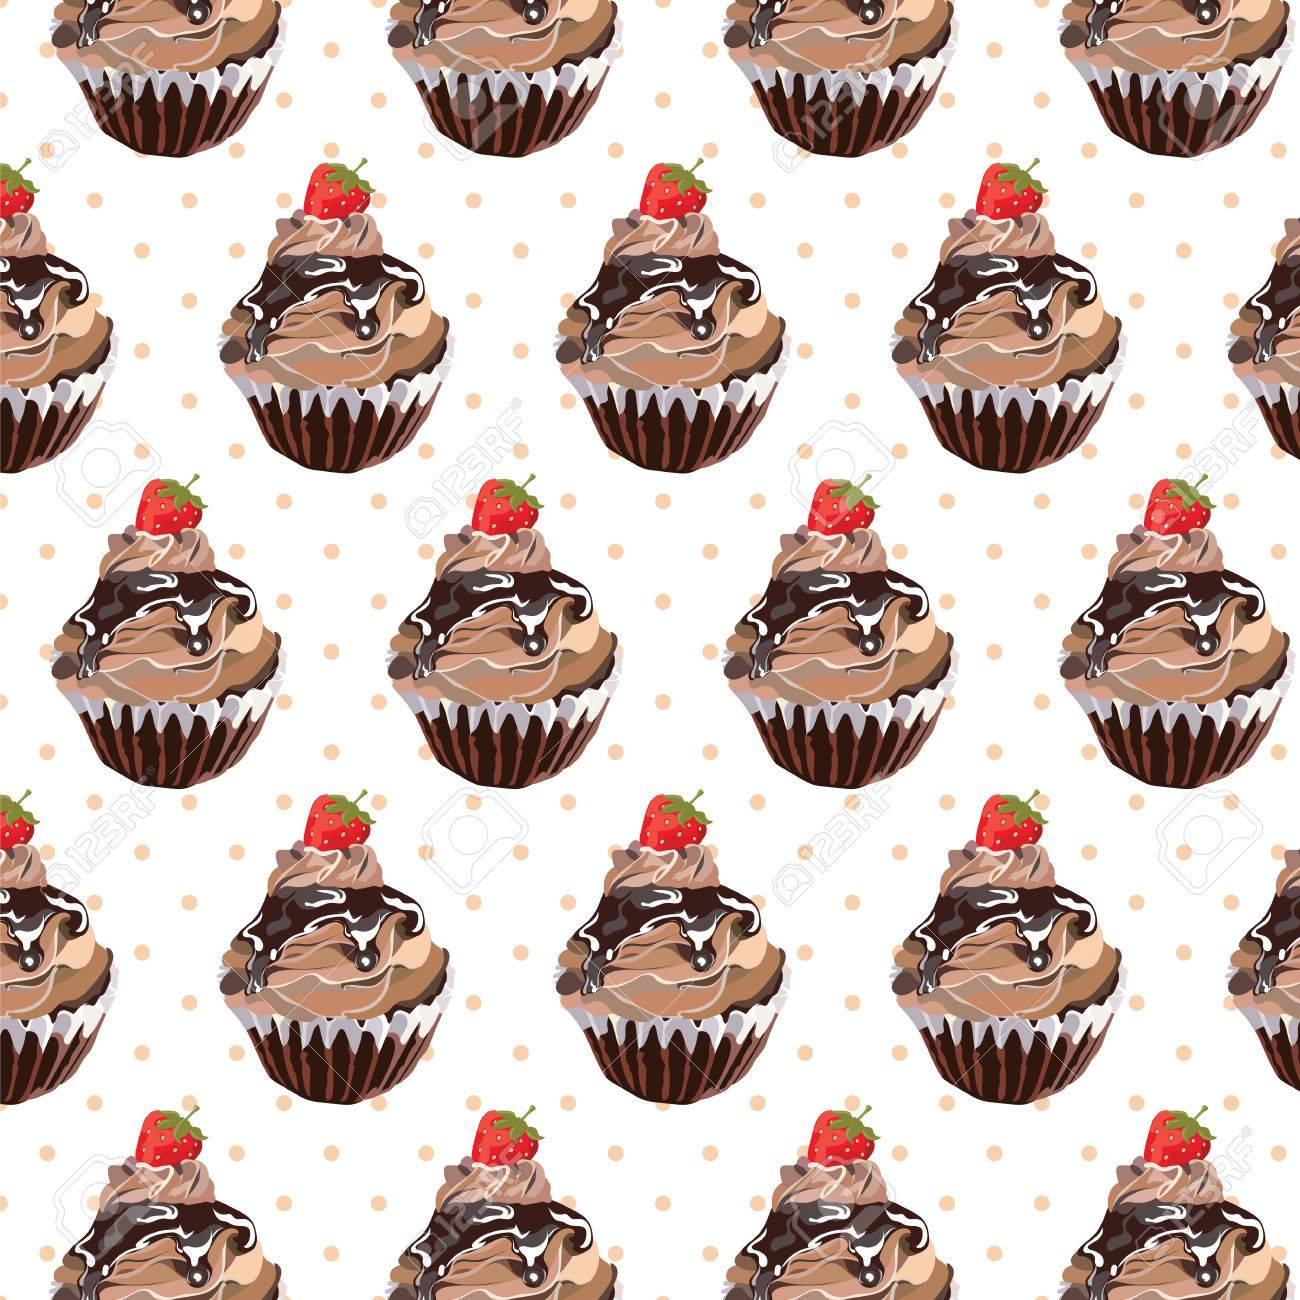 schokoladen kuchen muster vector kleinen kuchen dessert muster kstliche kuchen mit geschmolzene - Kuchen Muster